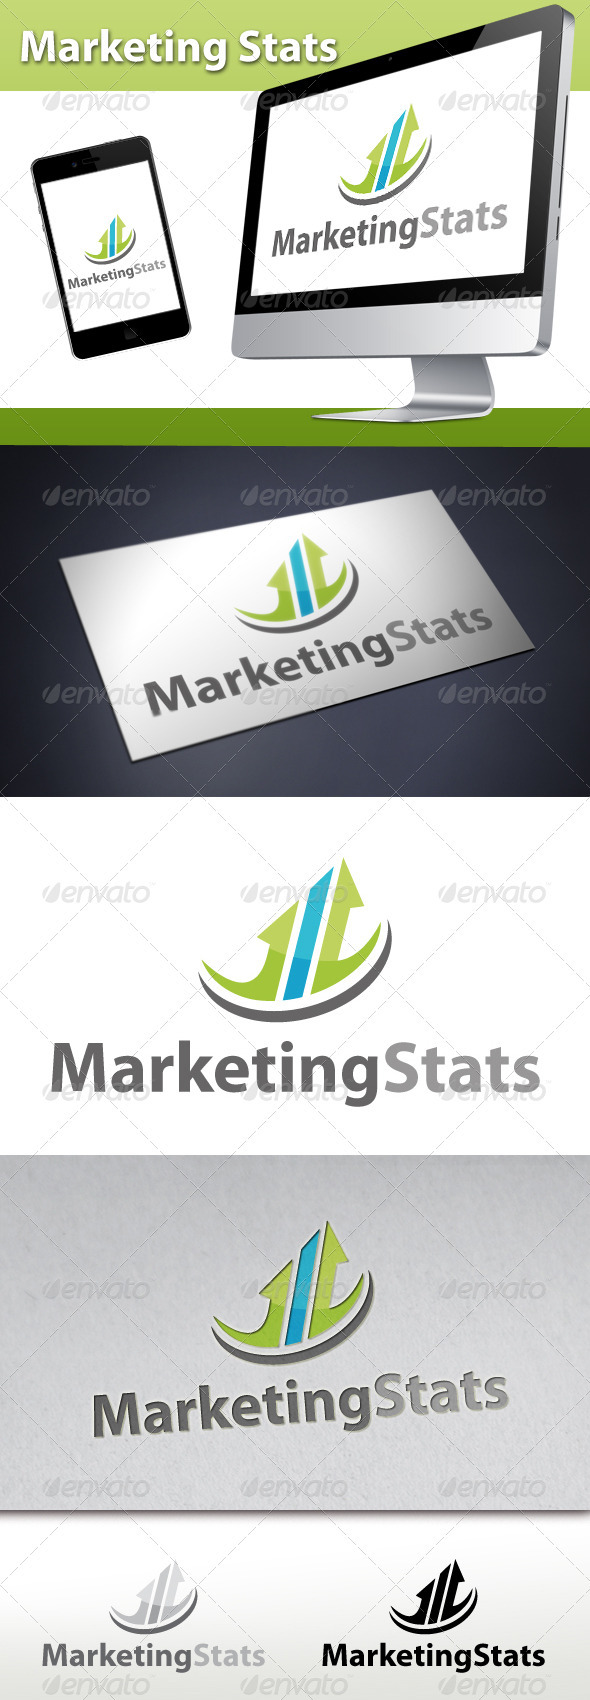 Marketing Stats Logo 1 - Symbols Logo Templates